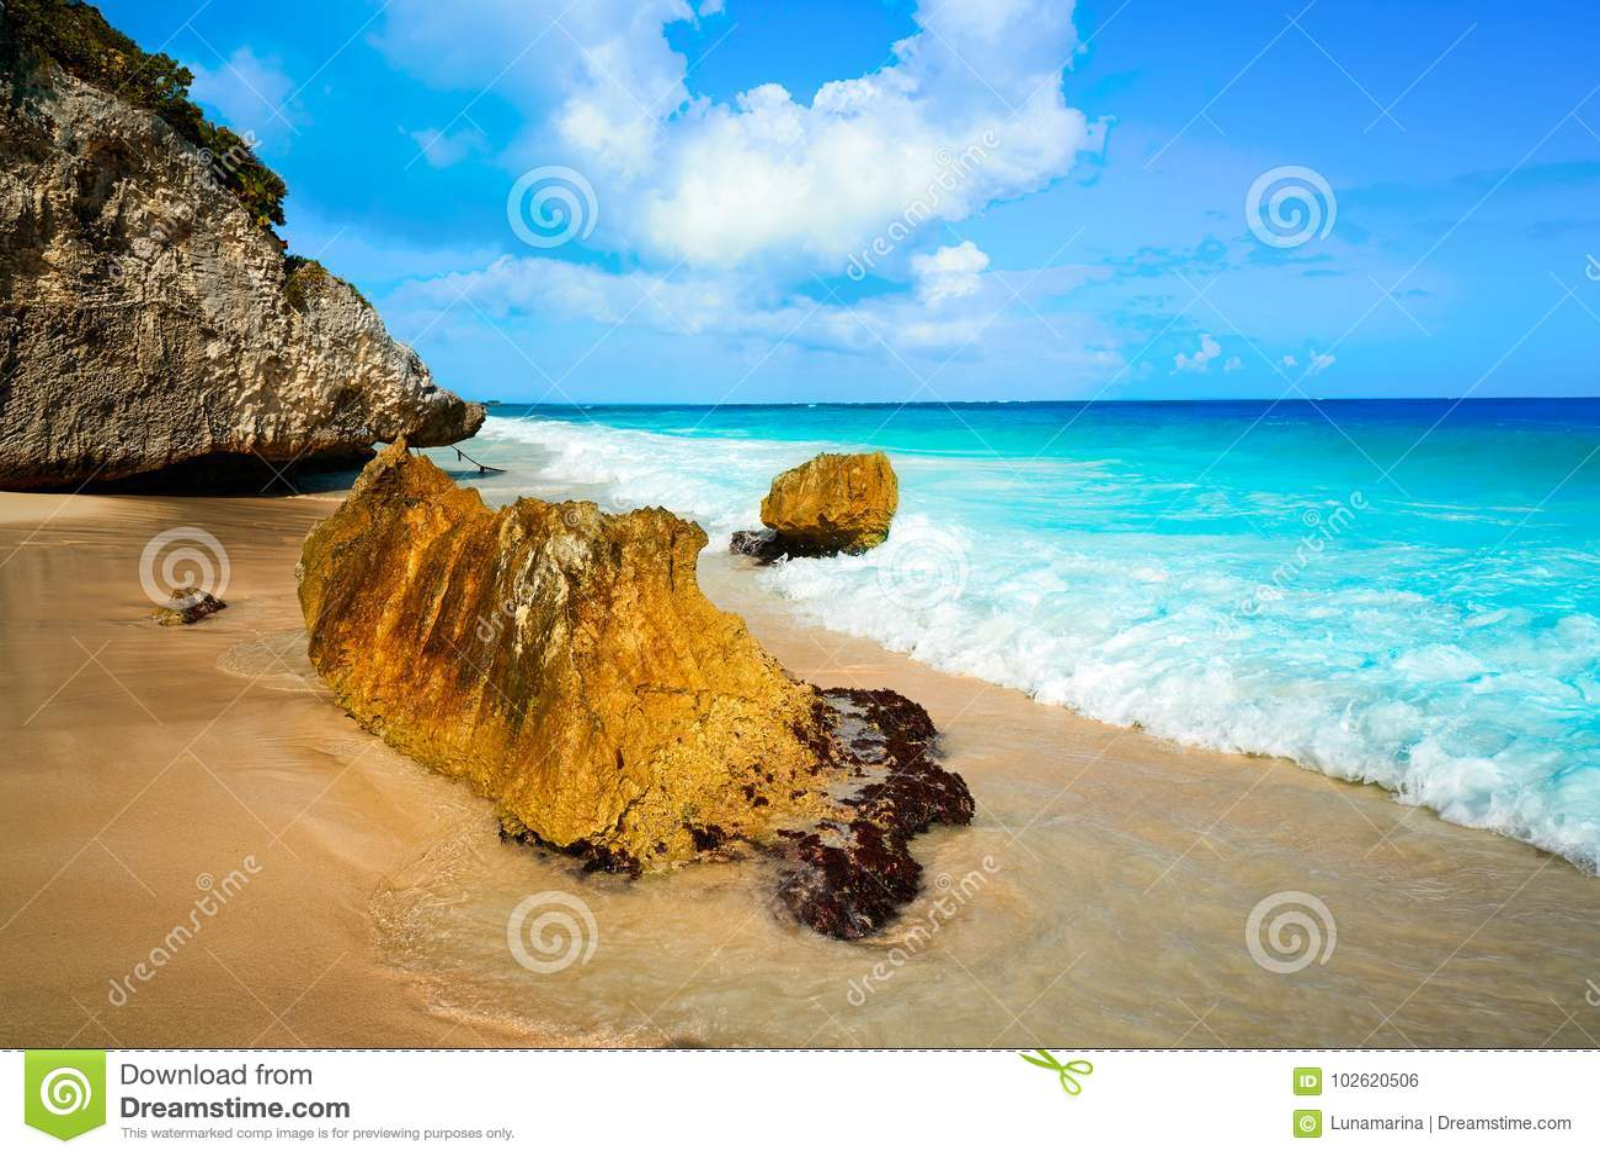 Tulum beach palm tree in Riviera Maya